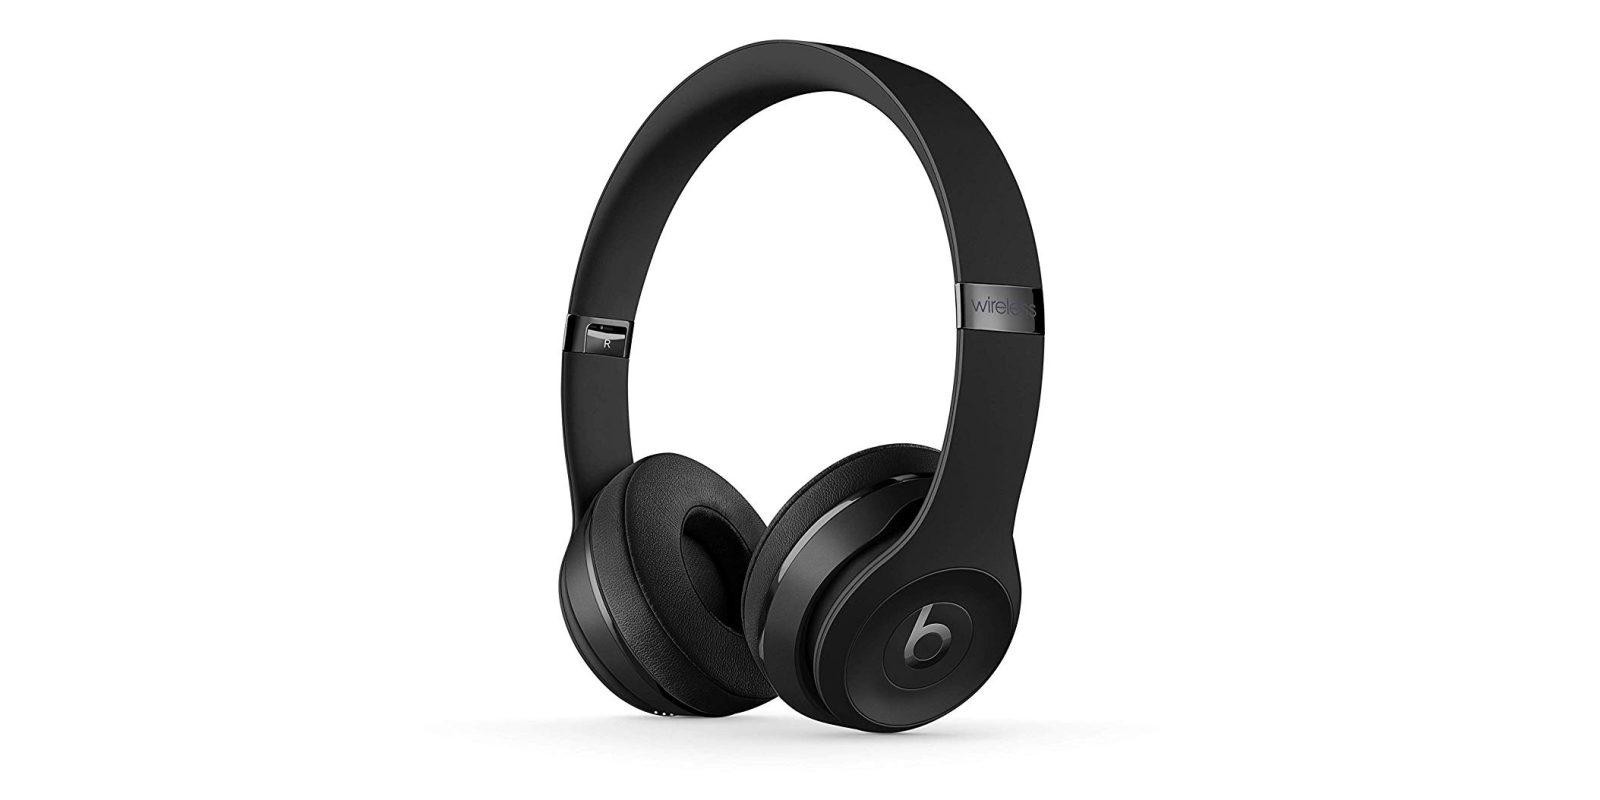 fc0ccca385a Beats Solo3 Wireless Headphones offer 40 hour battery life for $140 (Reg.  $190)